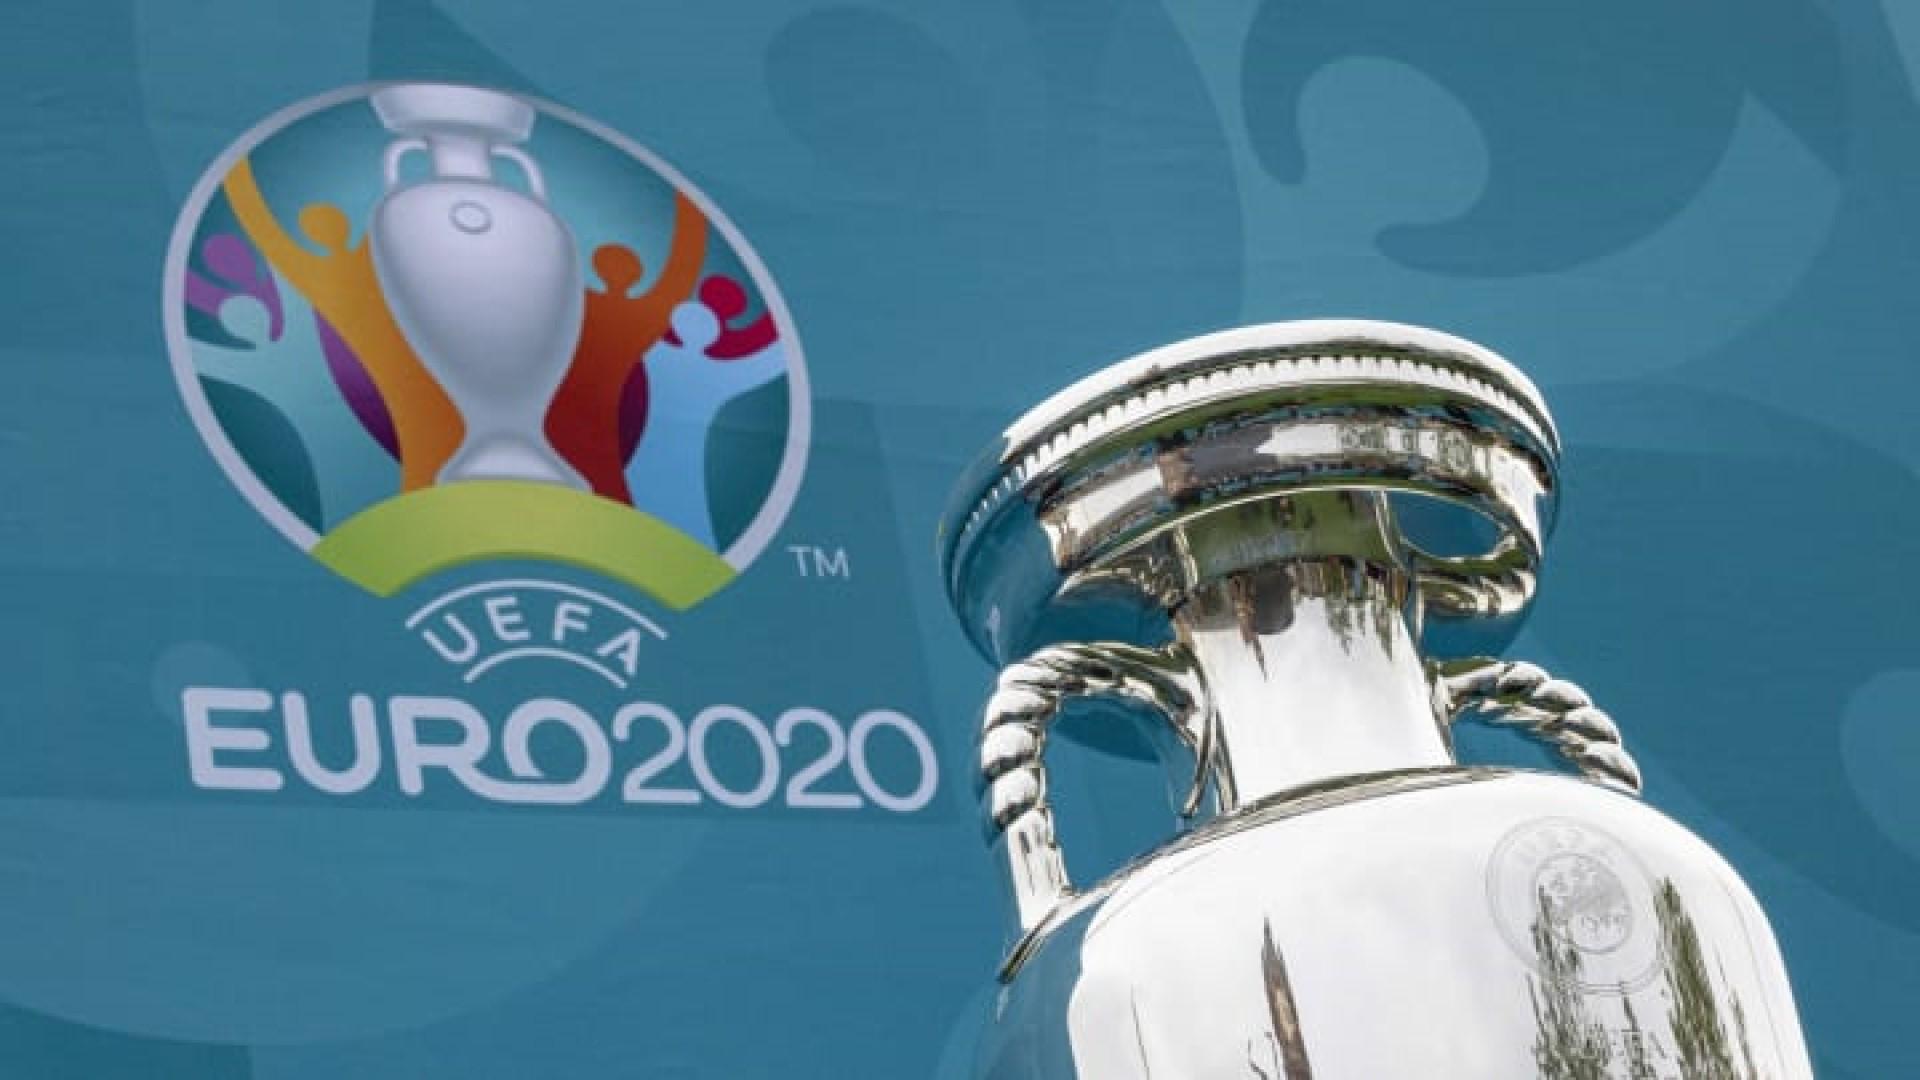 UEFA-EURO-2020-Trophy-Tour-Arrives-In-London-6b7037714b4602ac68242b1c29ad83e4